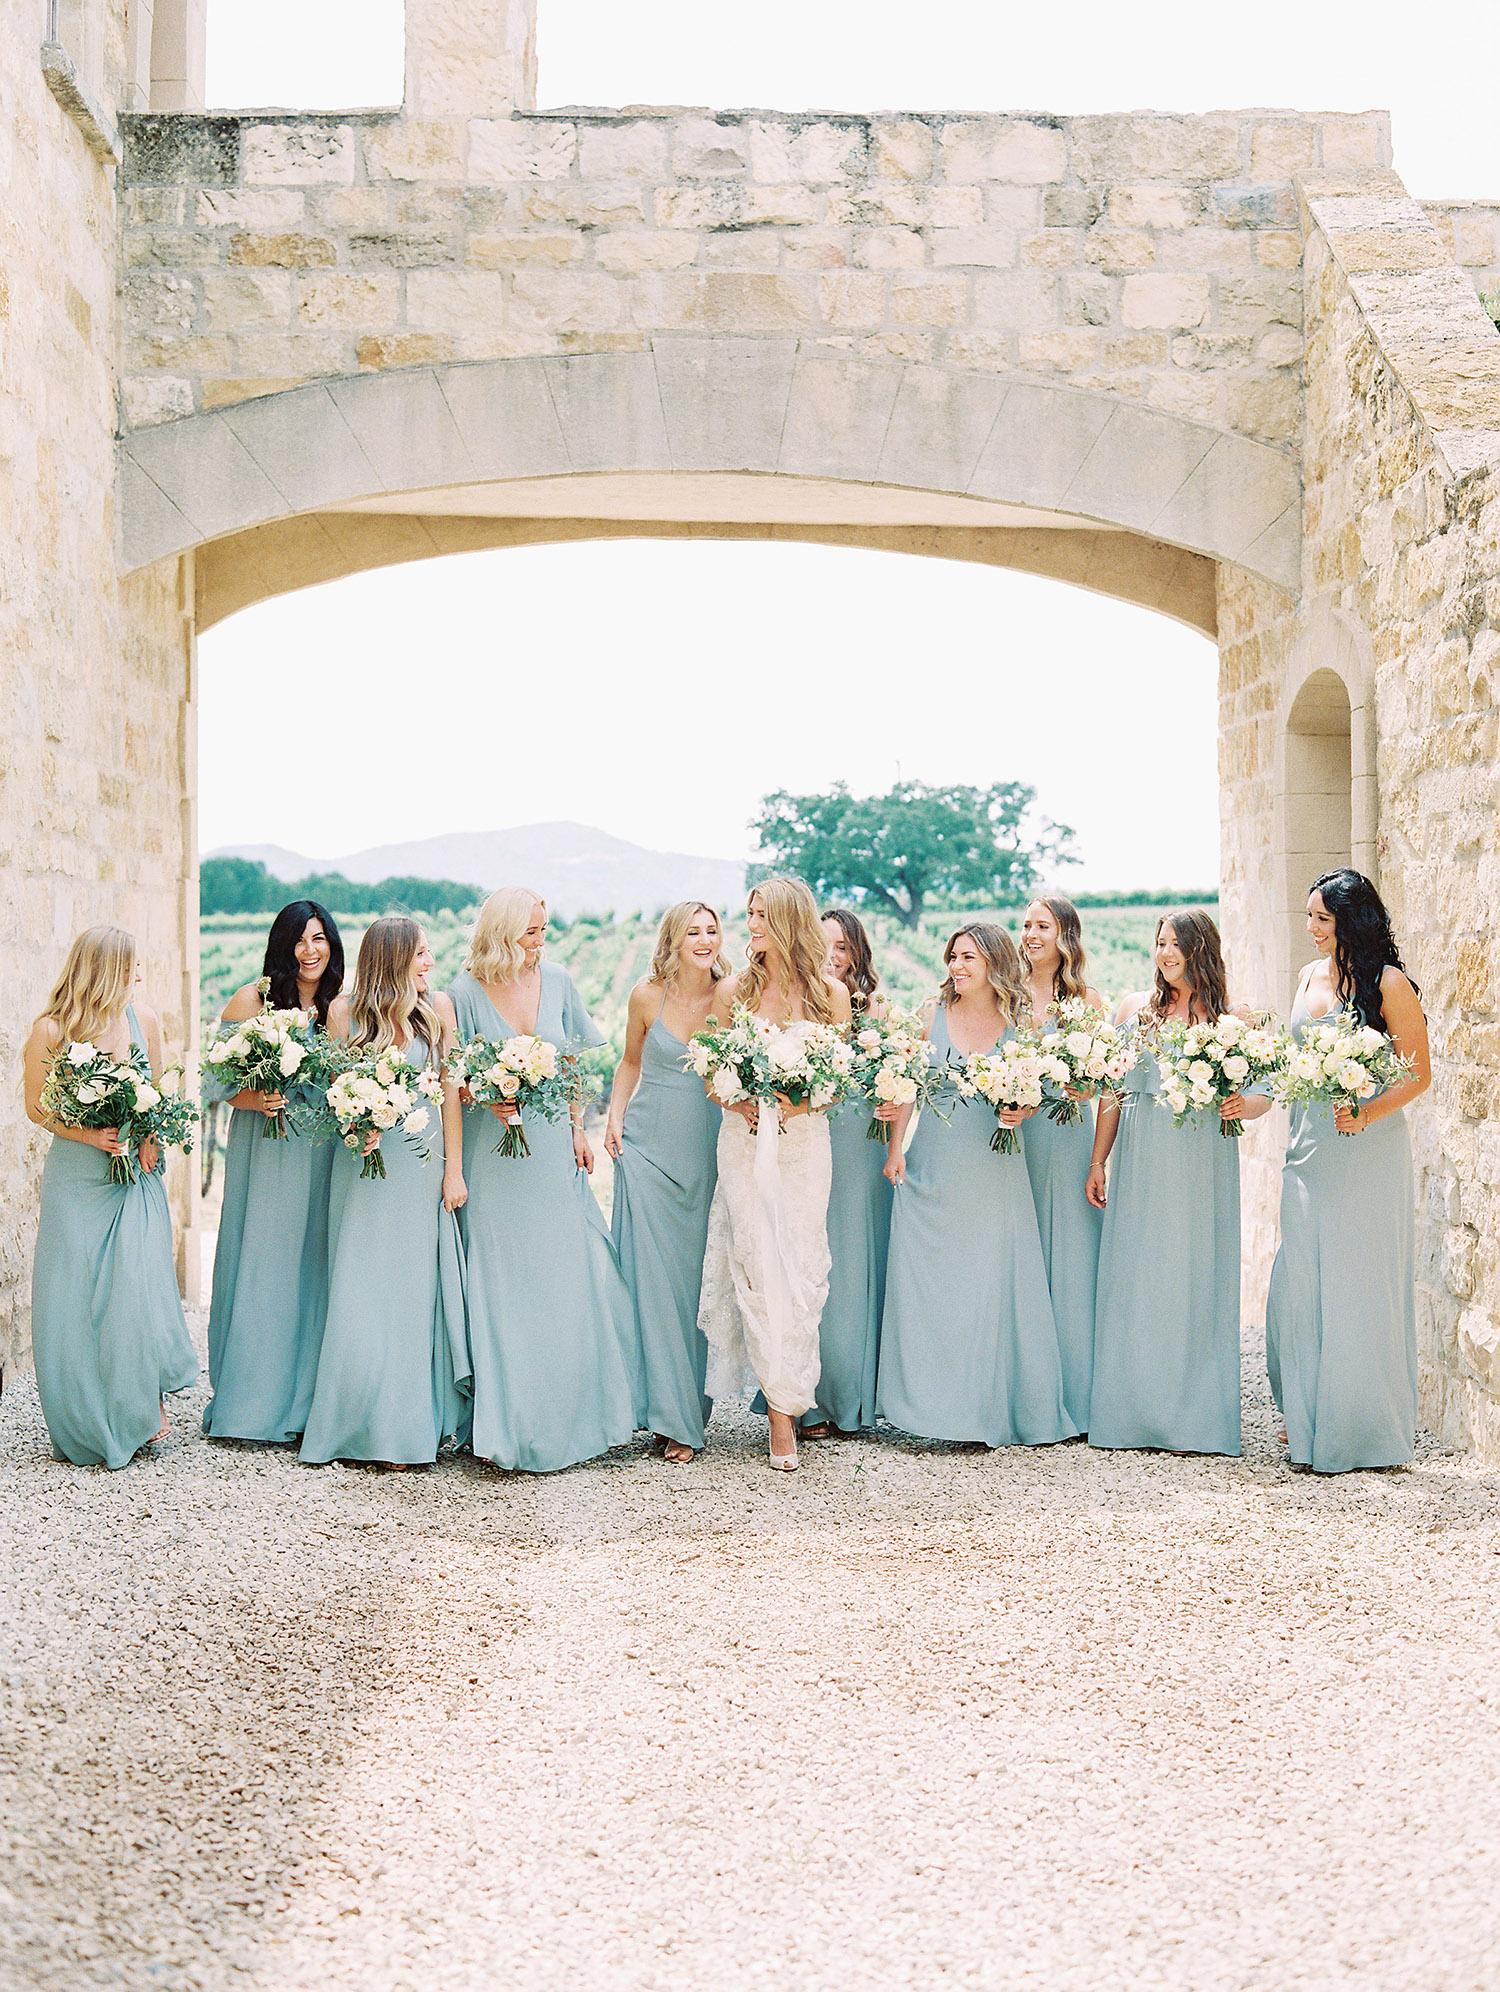 kati erik wedding bride bridesmaids in blue